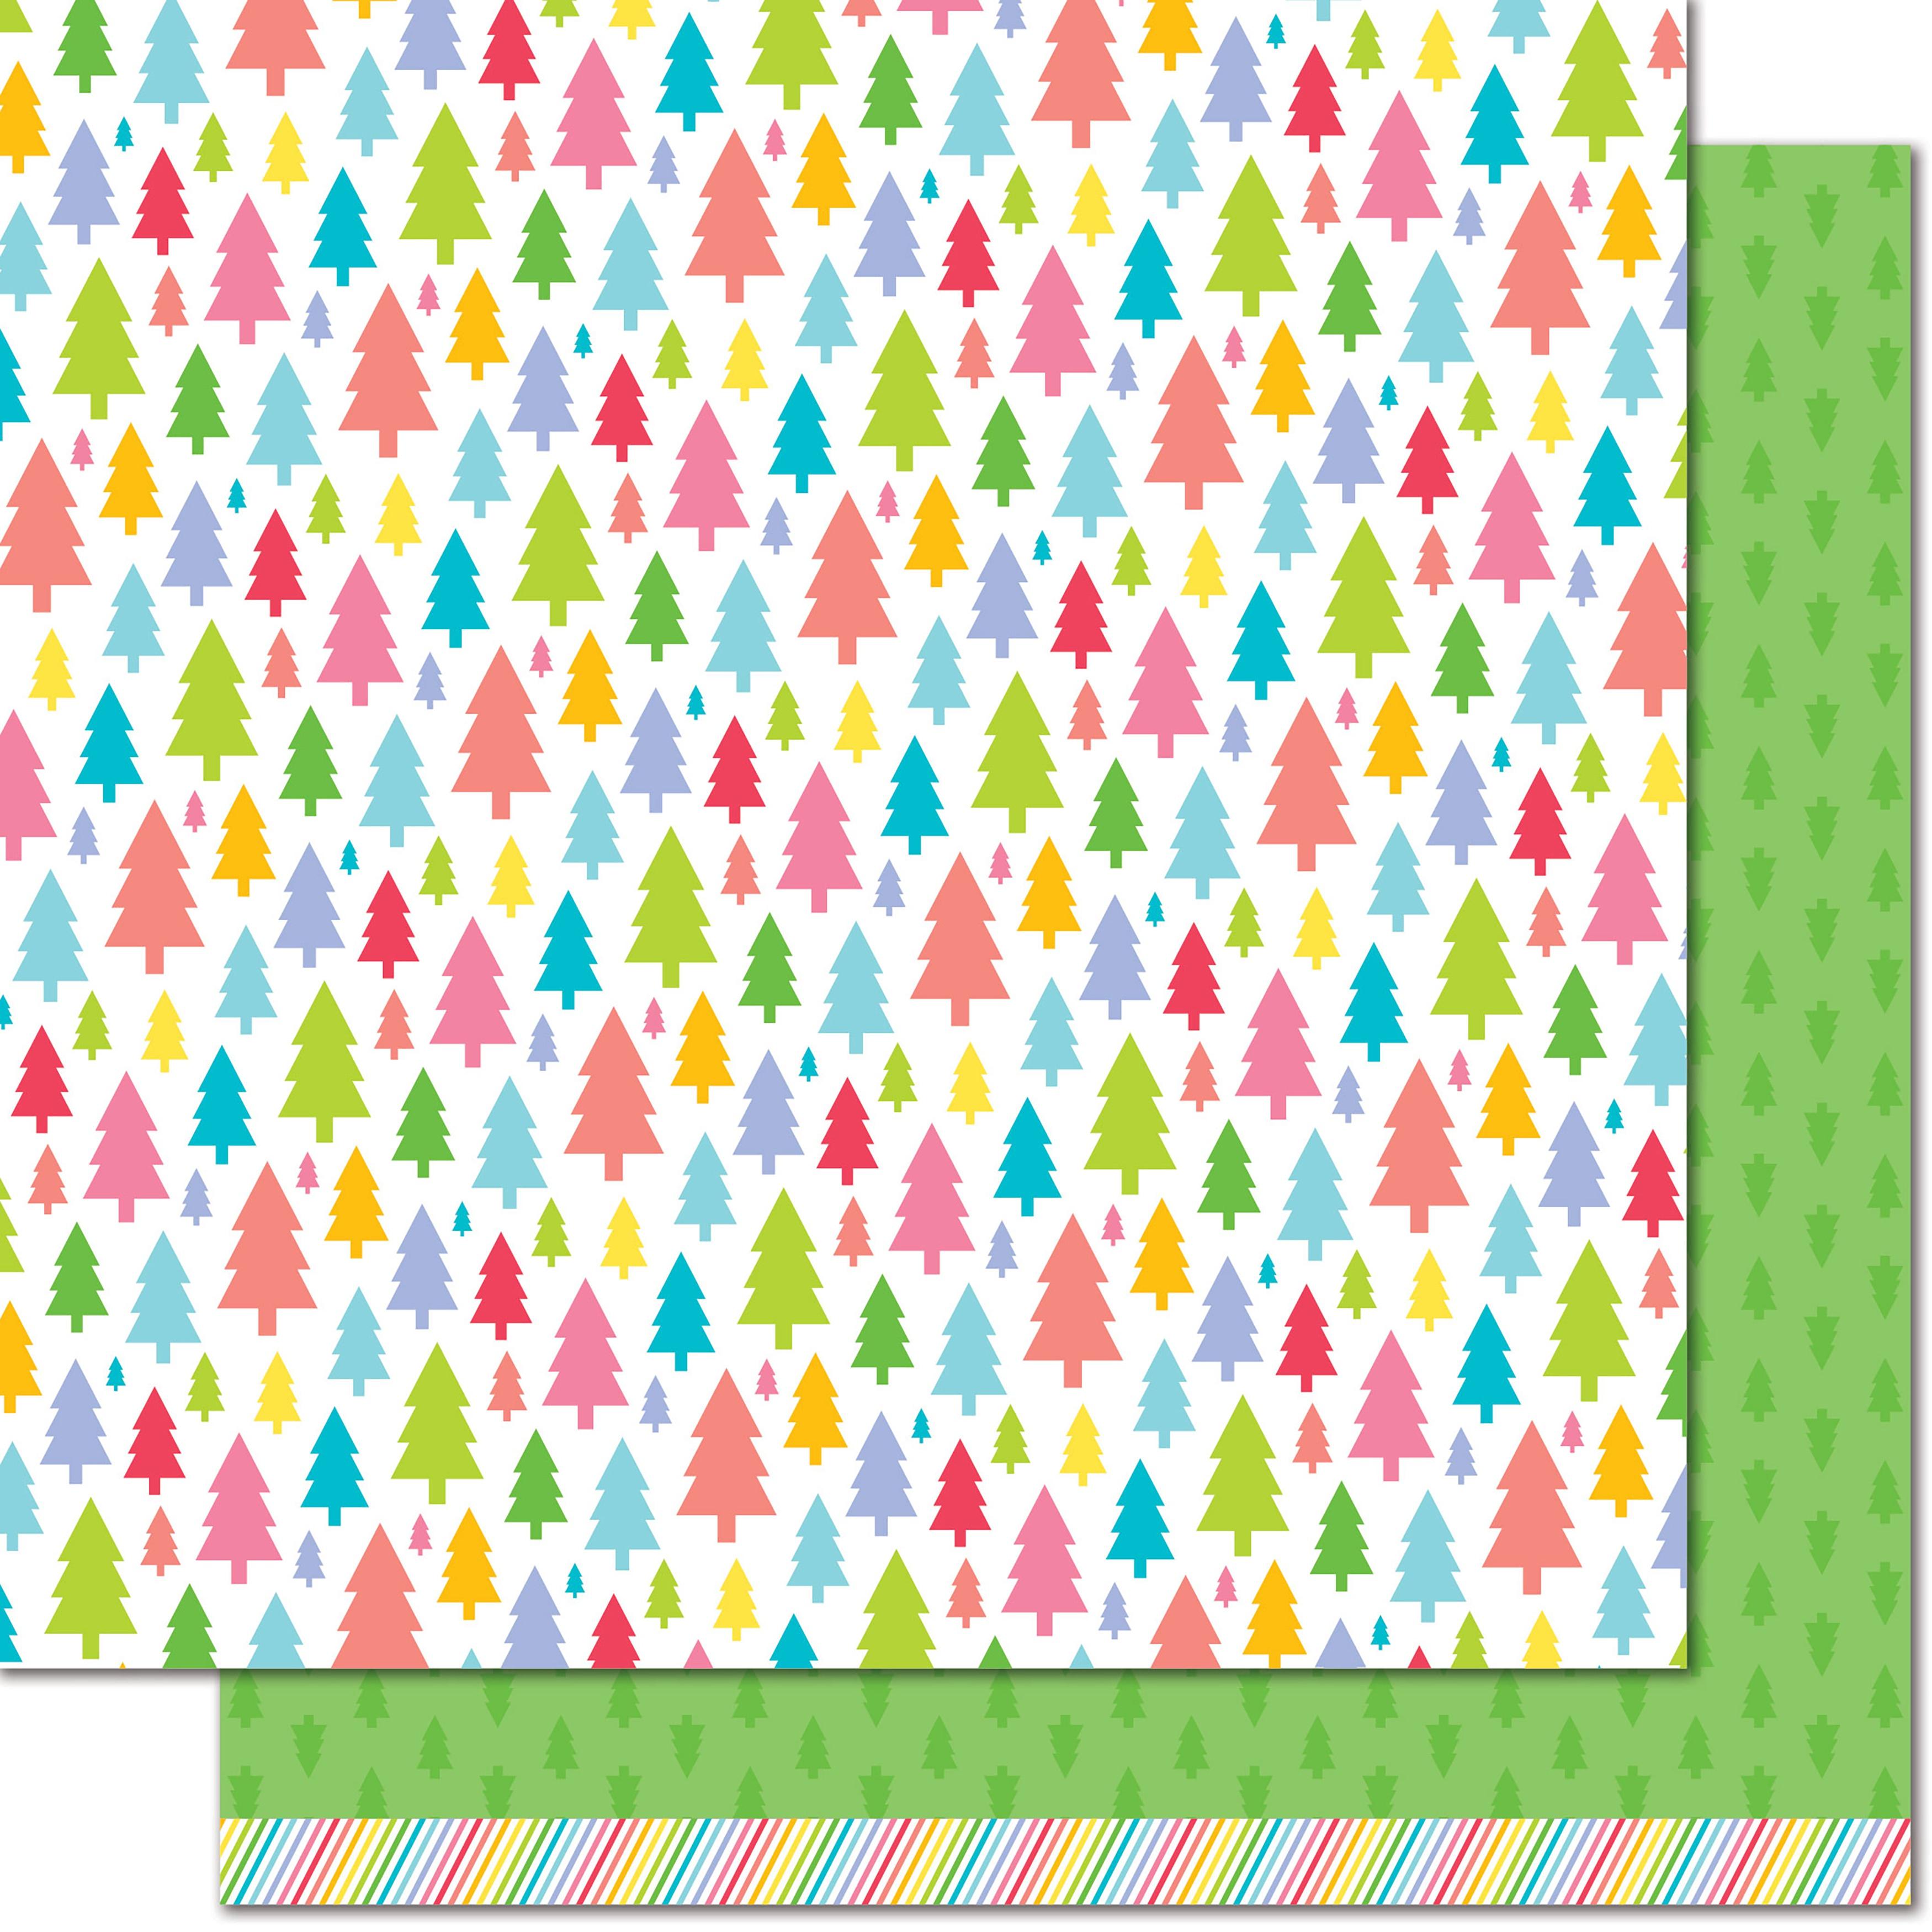 Lawn Fawn - Really Rainbow Christmas - Pine Tree Green